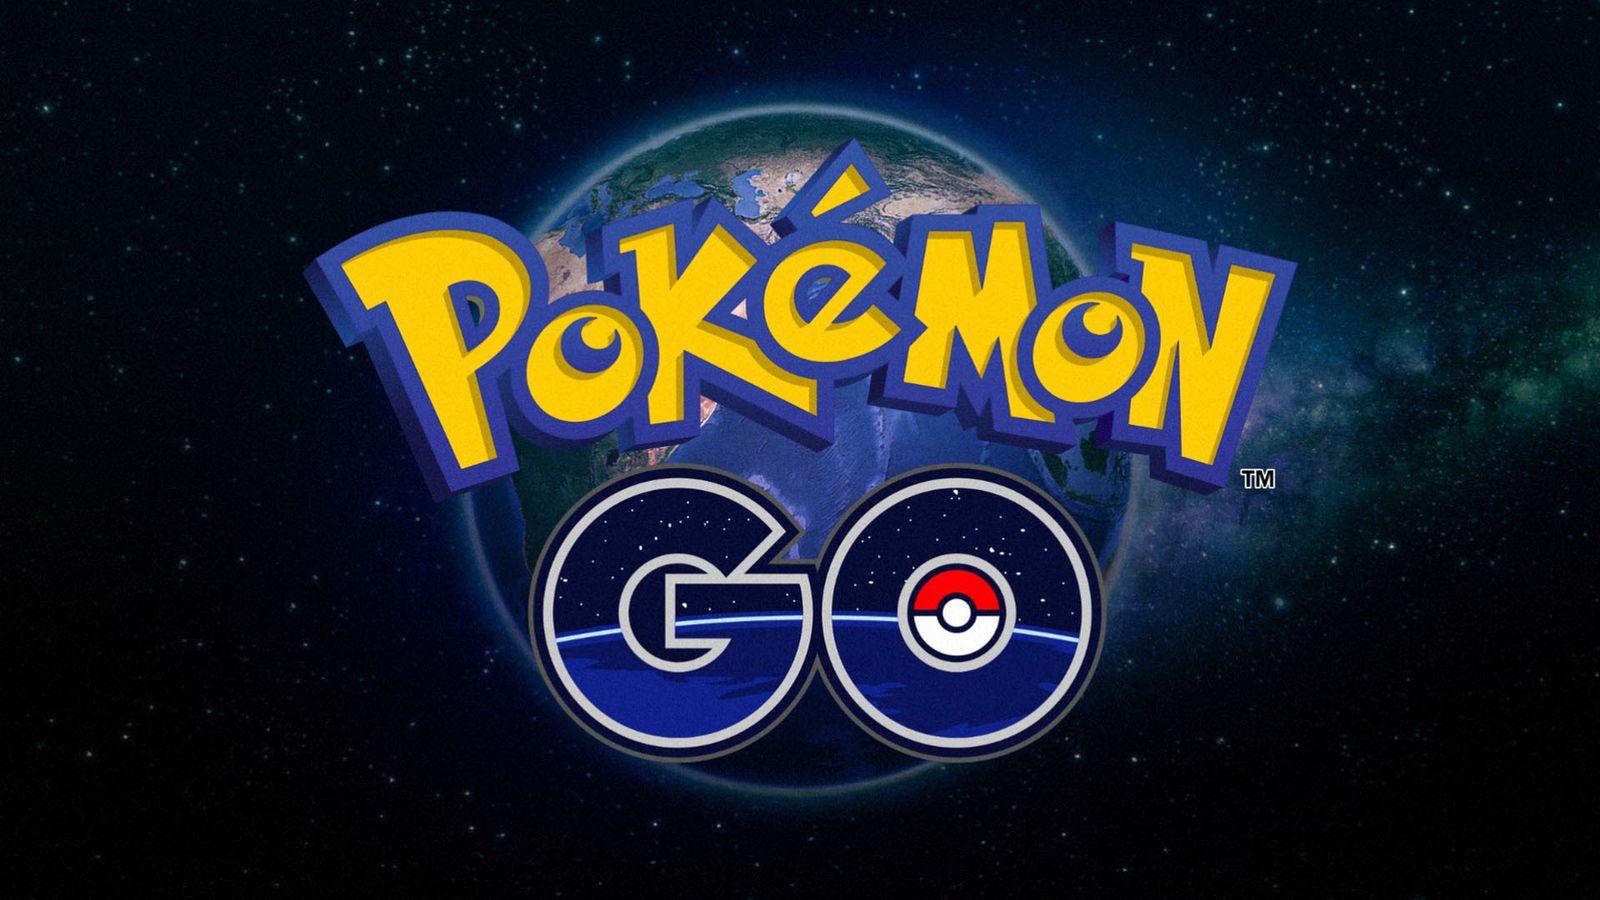 En Cok Aranan Pokemonlar Aciklandi